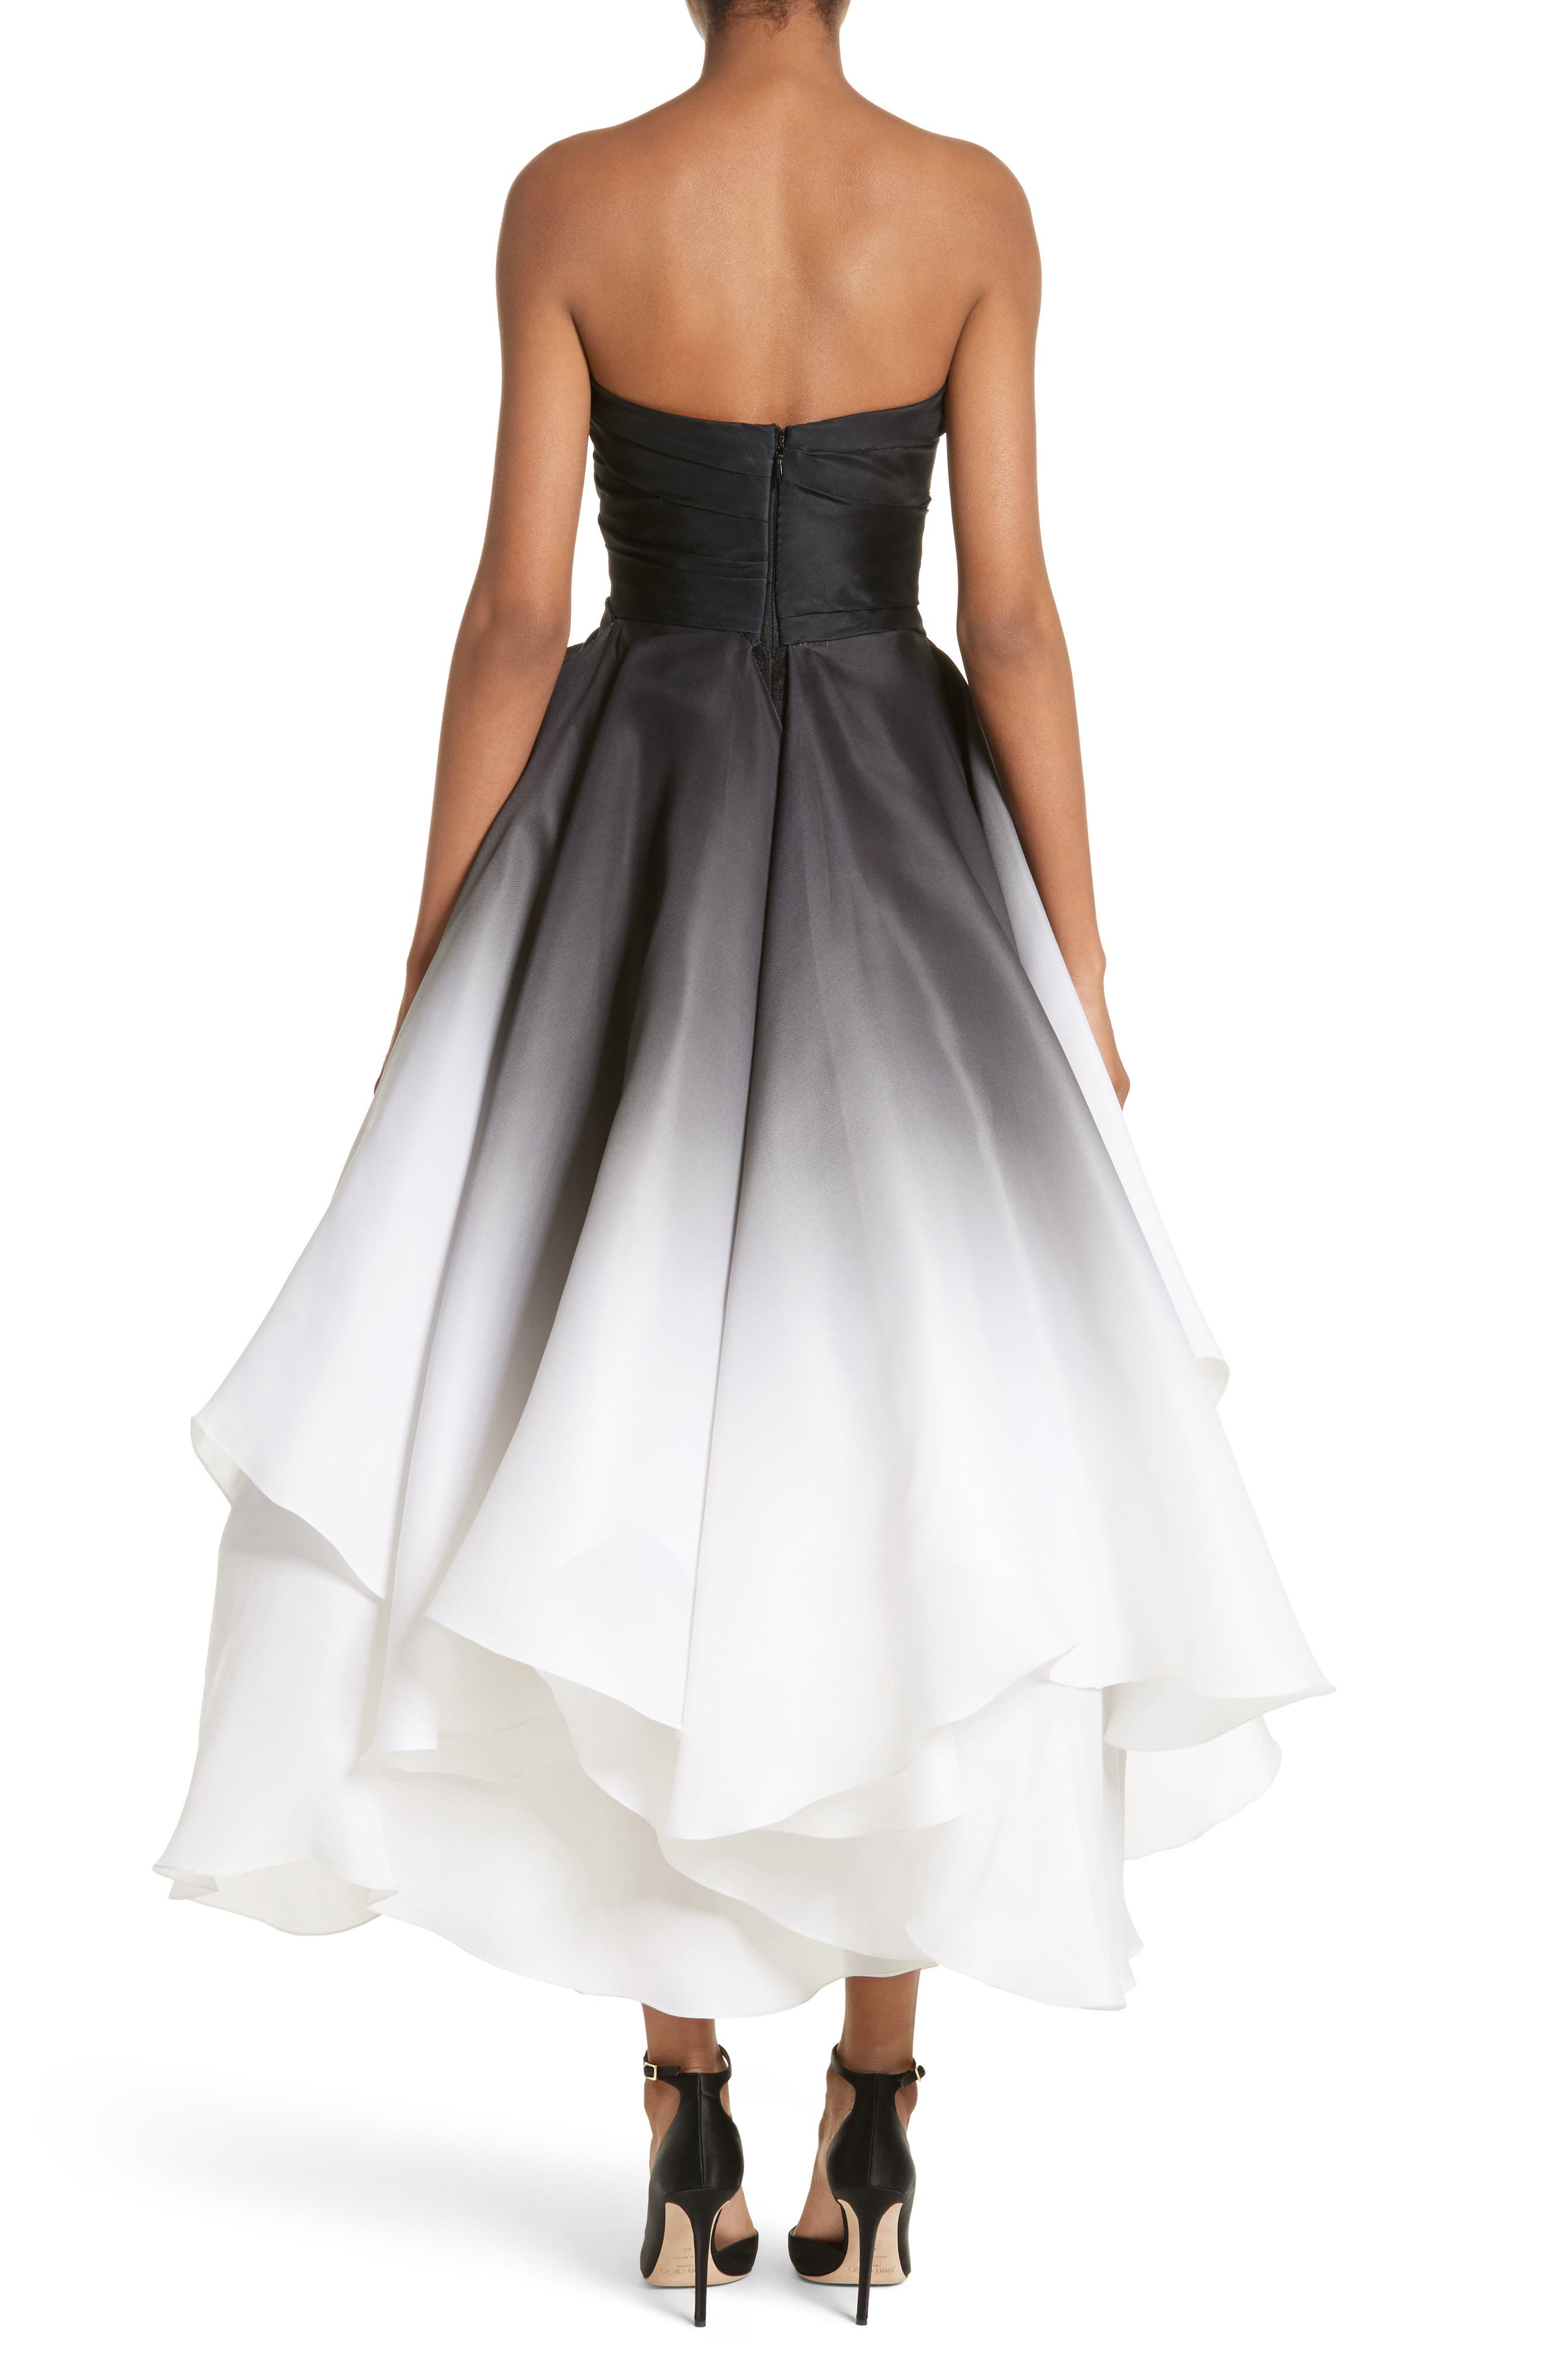 Ombré Strapless Tea Length Dress,                             Alternate thumbnail 3, color,                             Black/ White